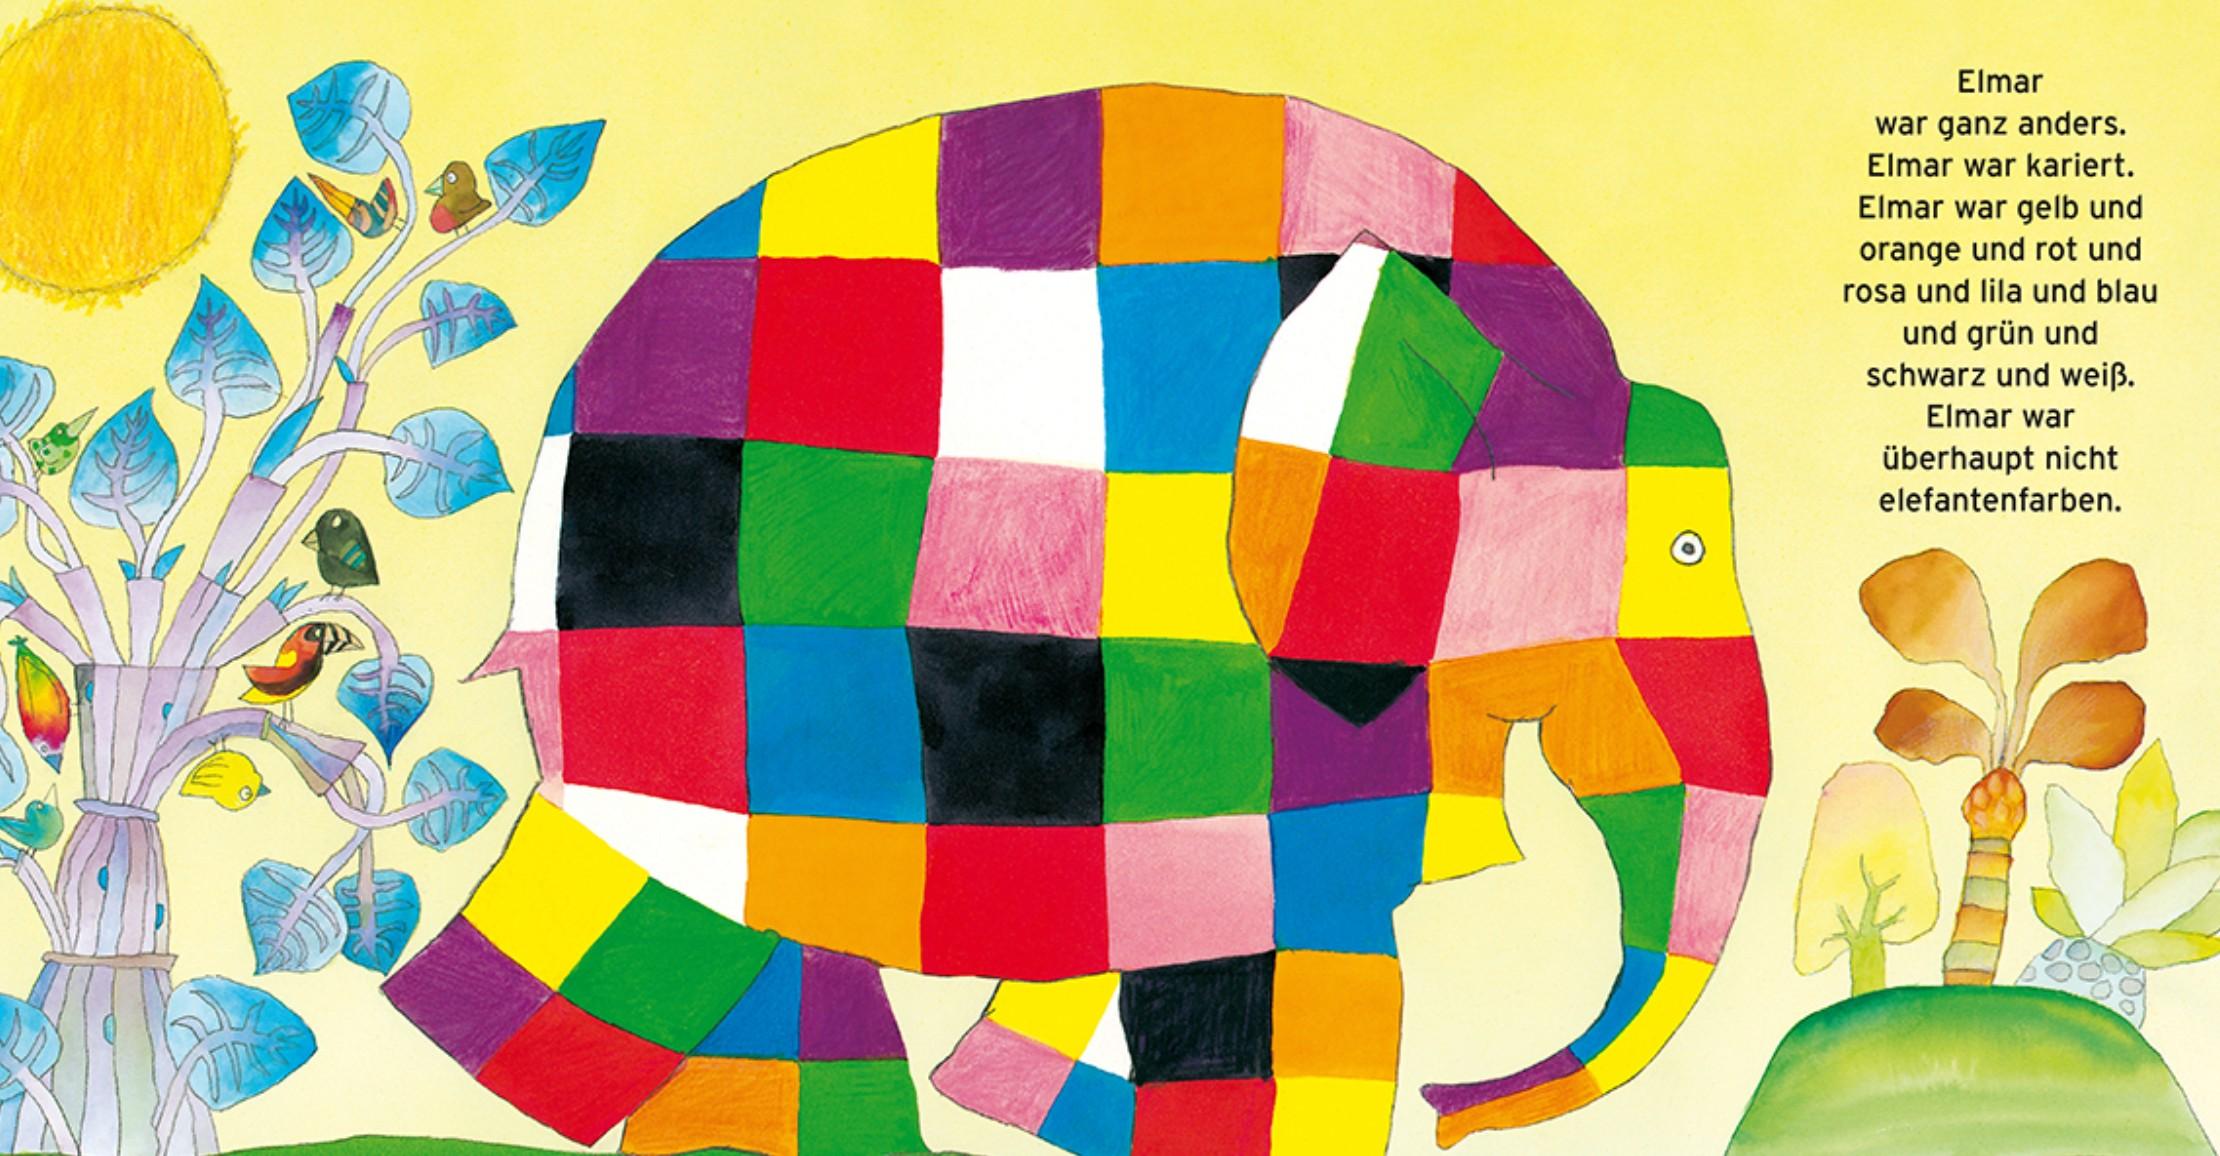 Elmar Der Bunte Elefant